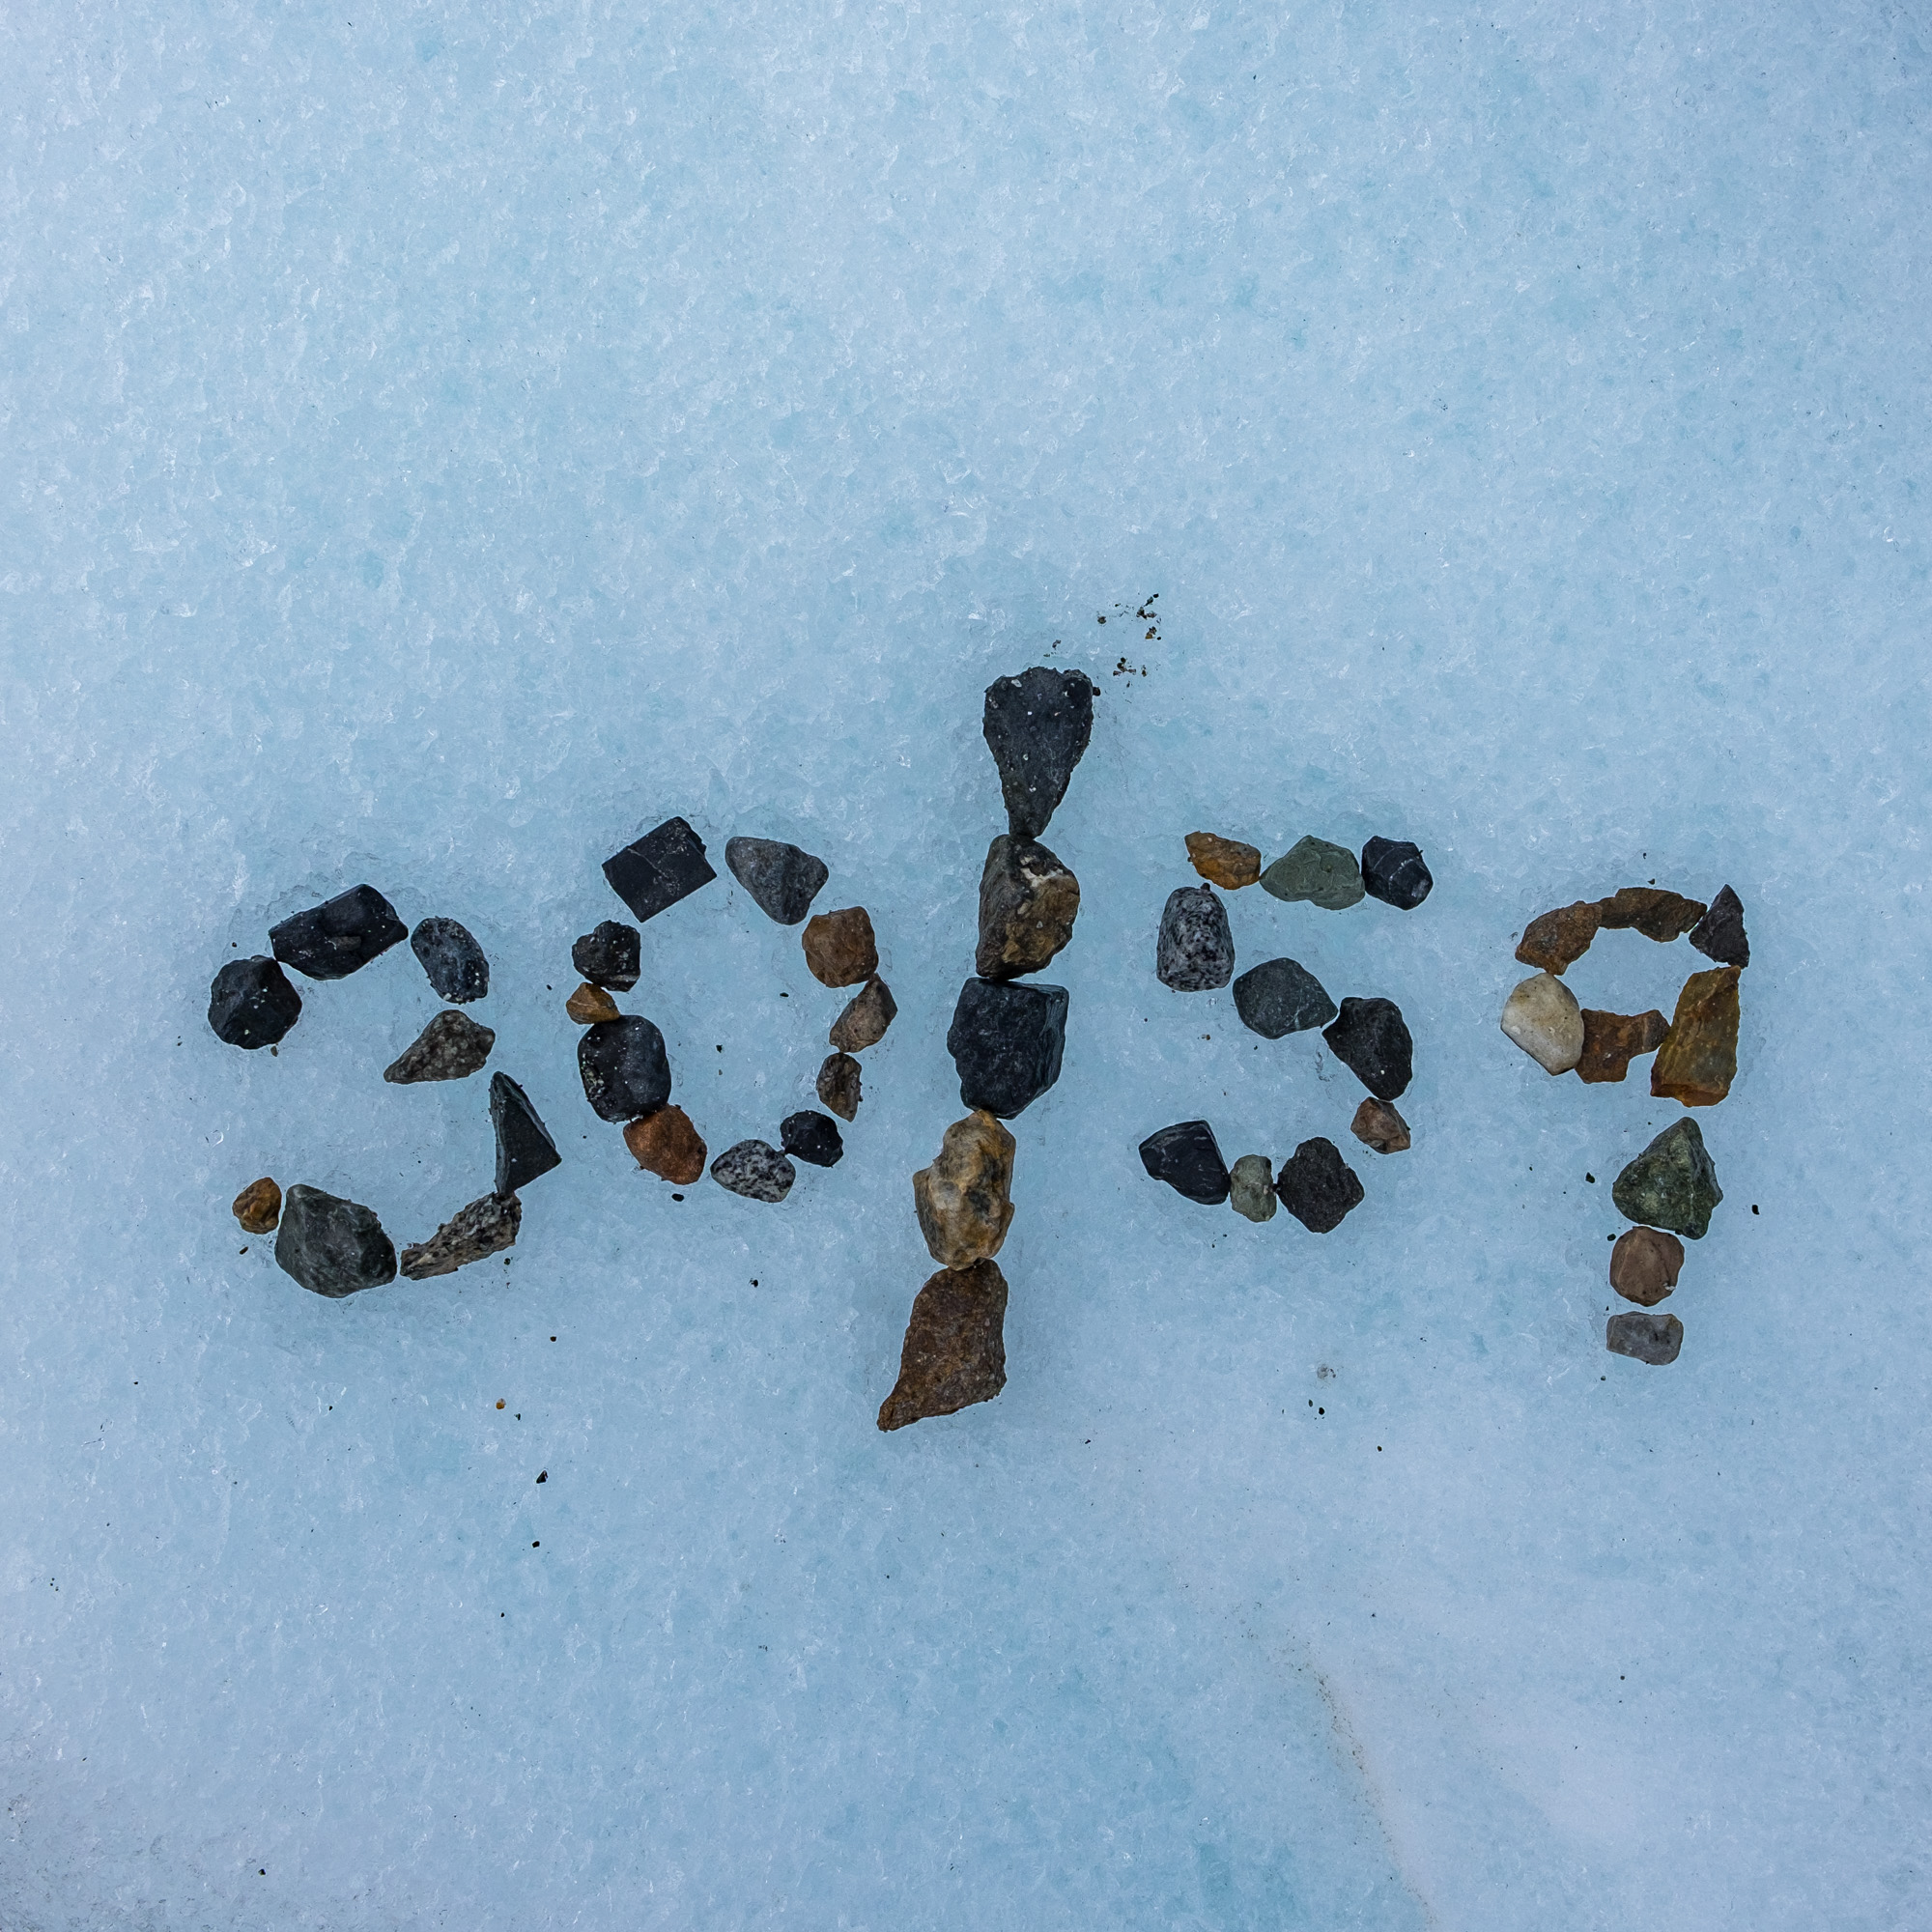 Glacier Bay National Park...30 parks down, 29 to go!